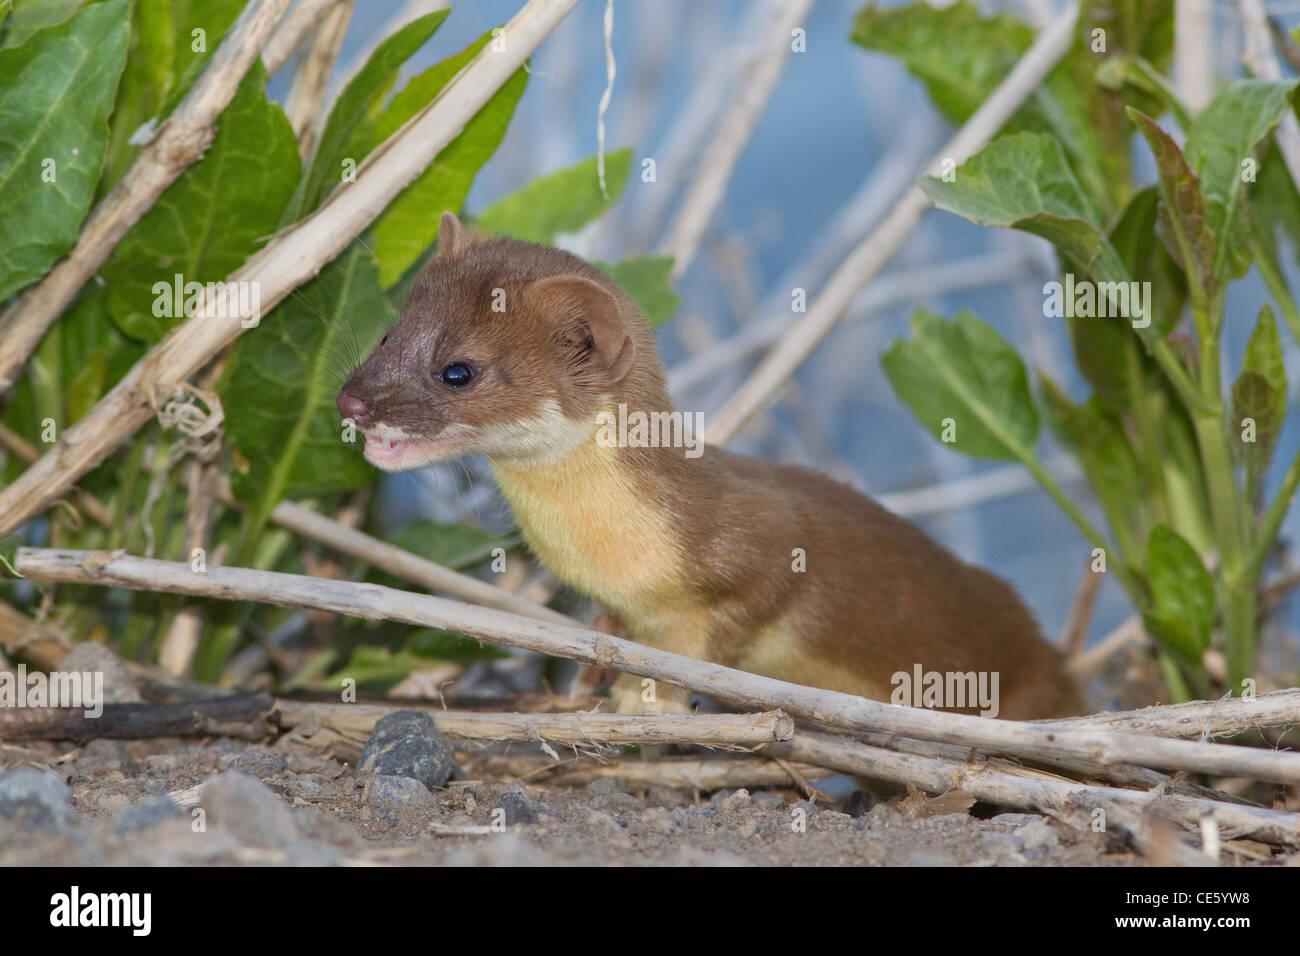 Long-tailed Weasel Mustela frenata Clear Lake National Wildlife Refuge, California, United States 10 May Immature - Stock Image